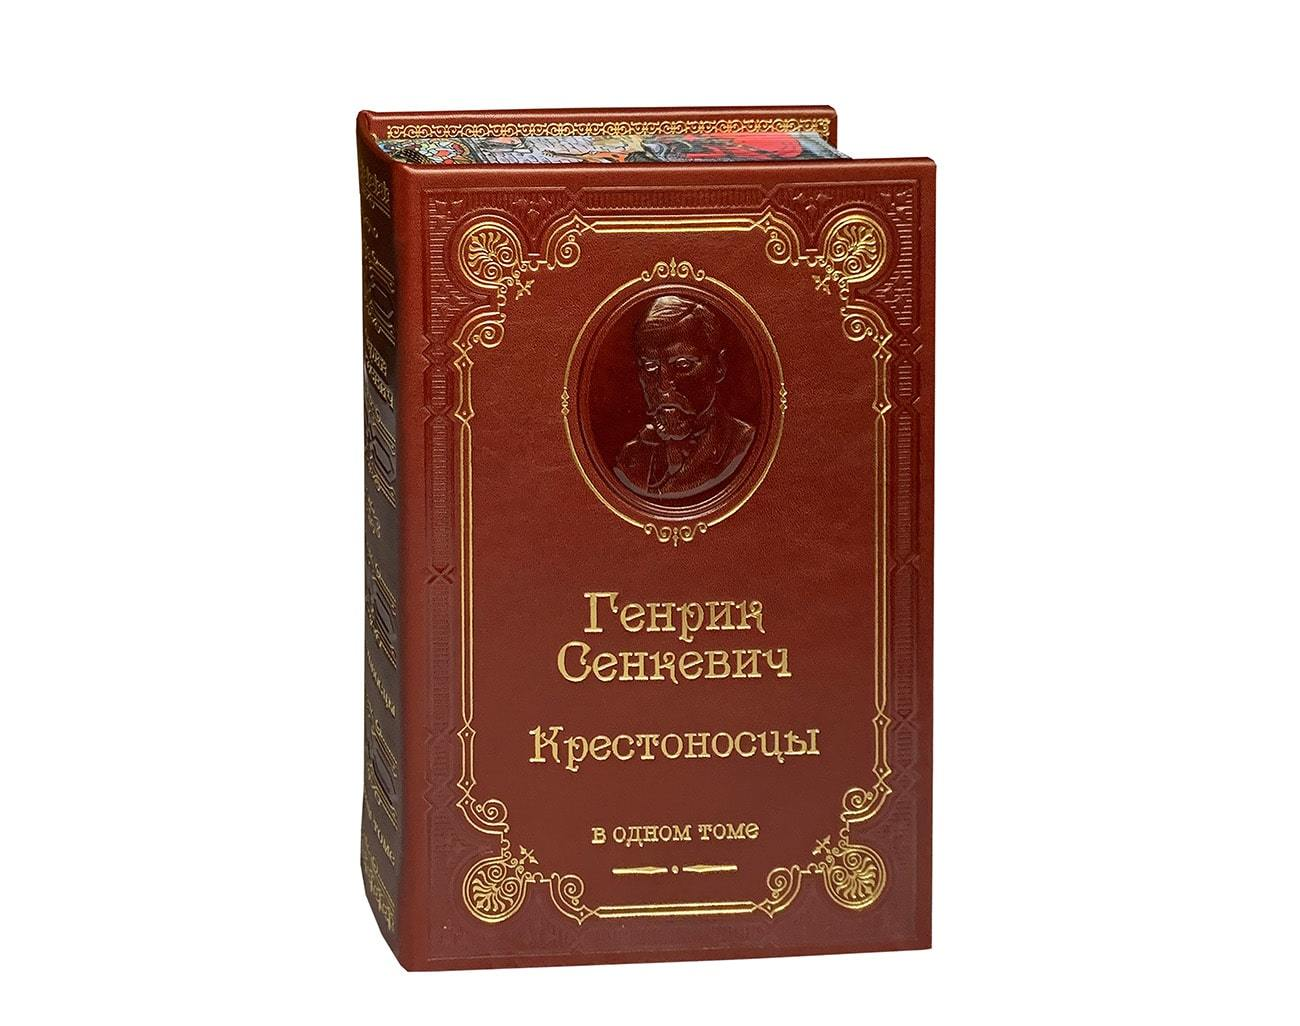 Сенкевич Г. Крестоносцы